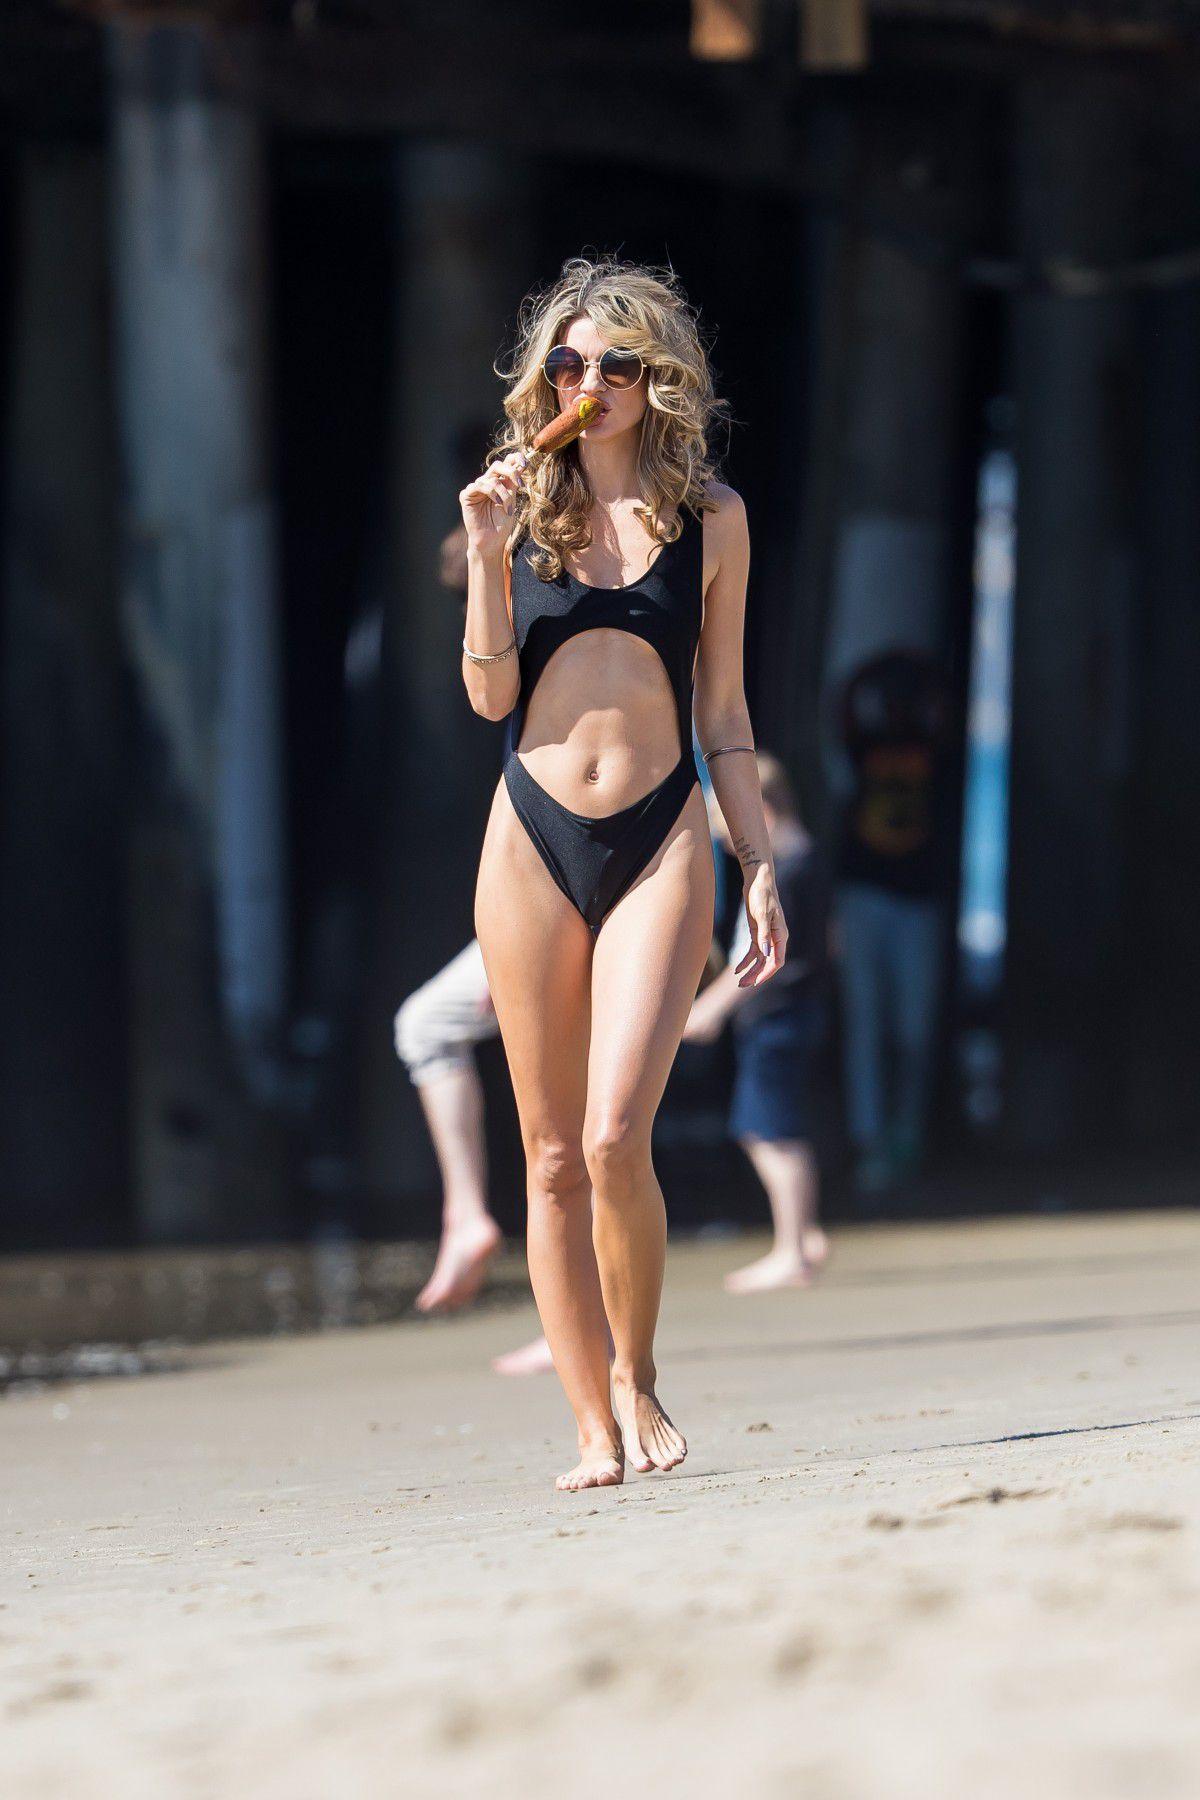 rachel-mccord-cameltoe-in-black-swimsuit-on-the-beach-in-santa-monica-8572